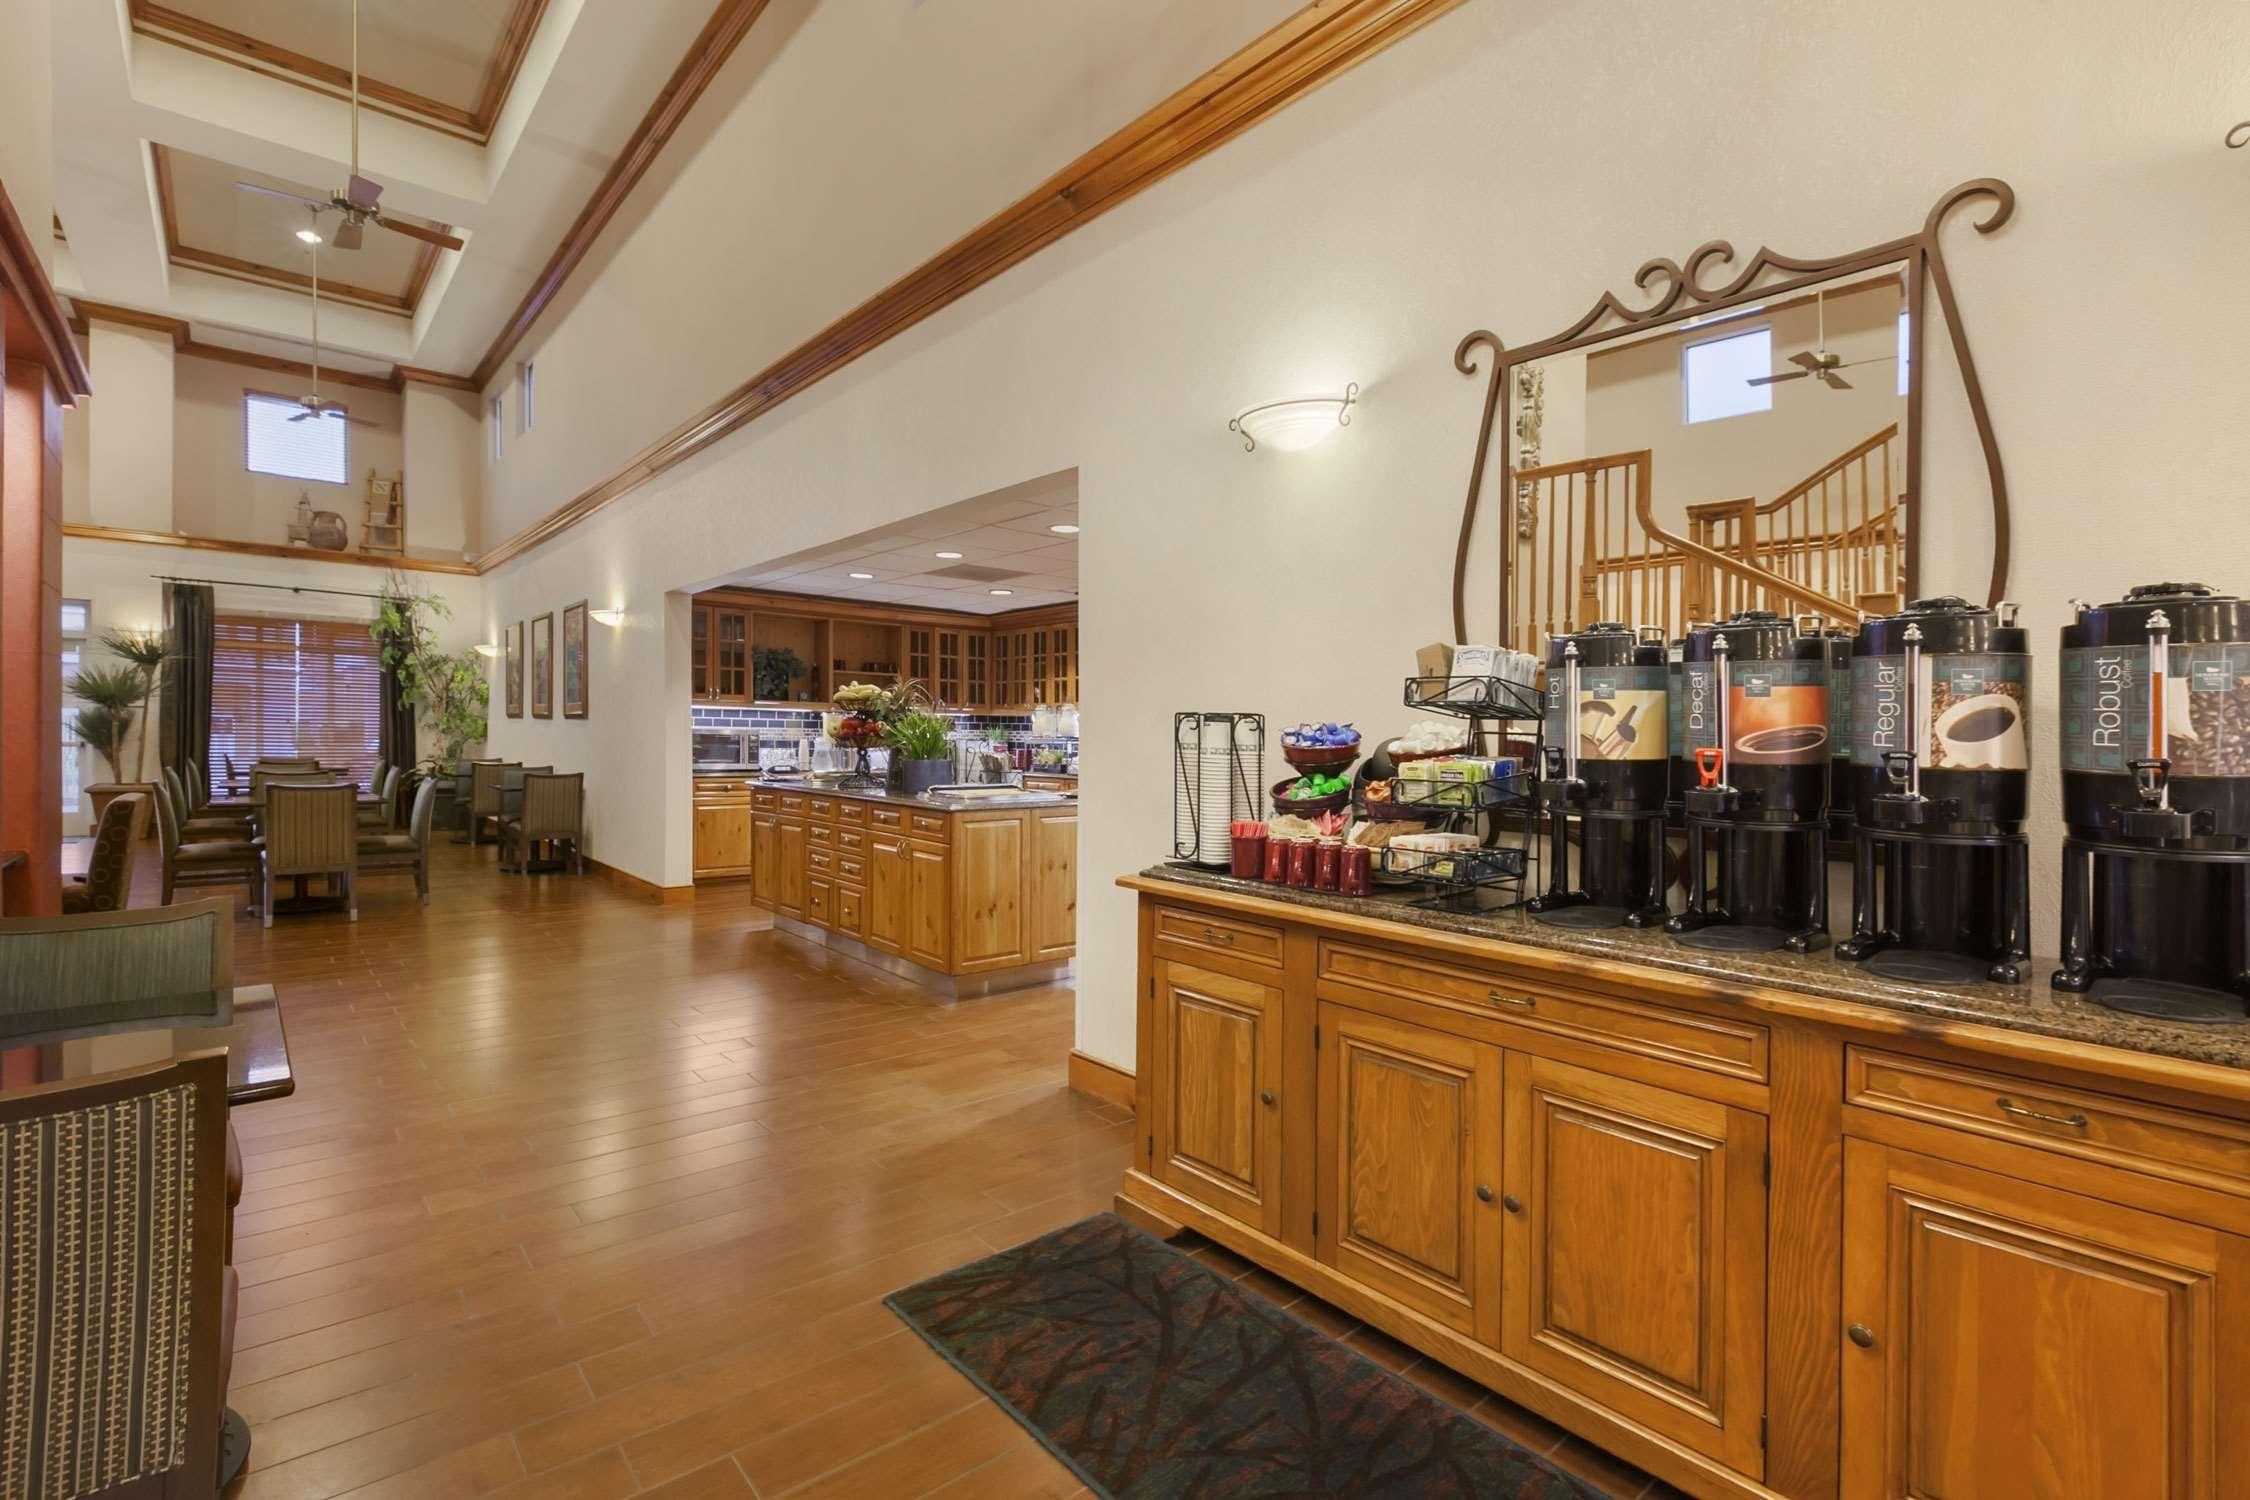 Homewood Suites by Hilton Phoenix/Scottsdale image 5